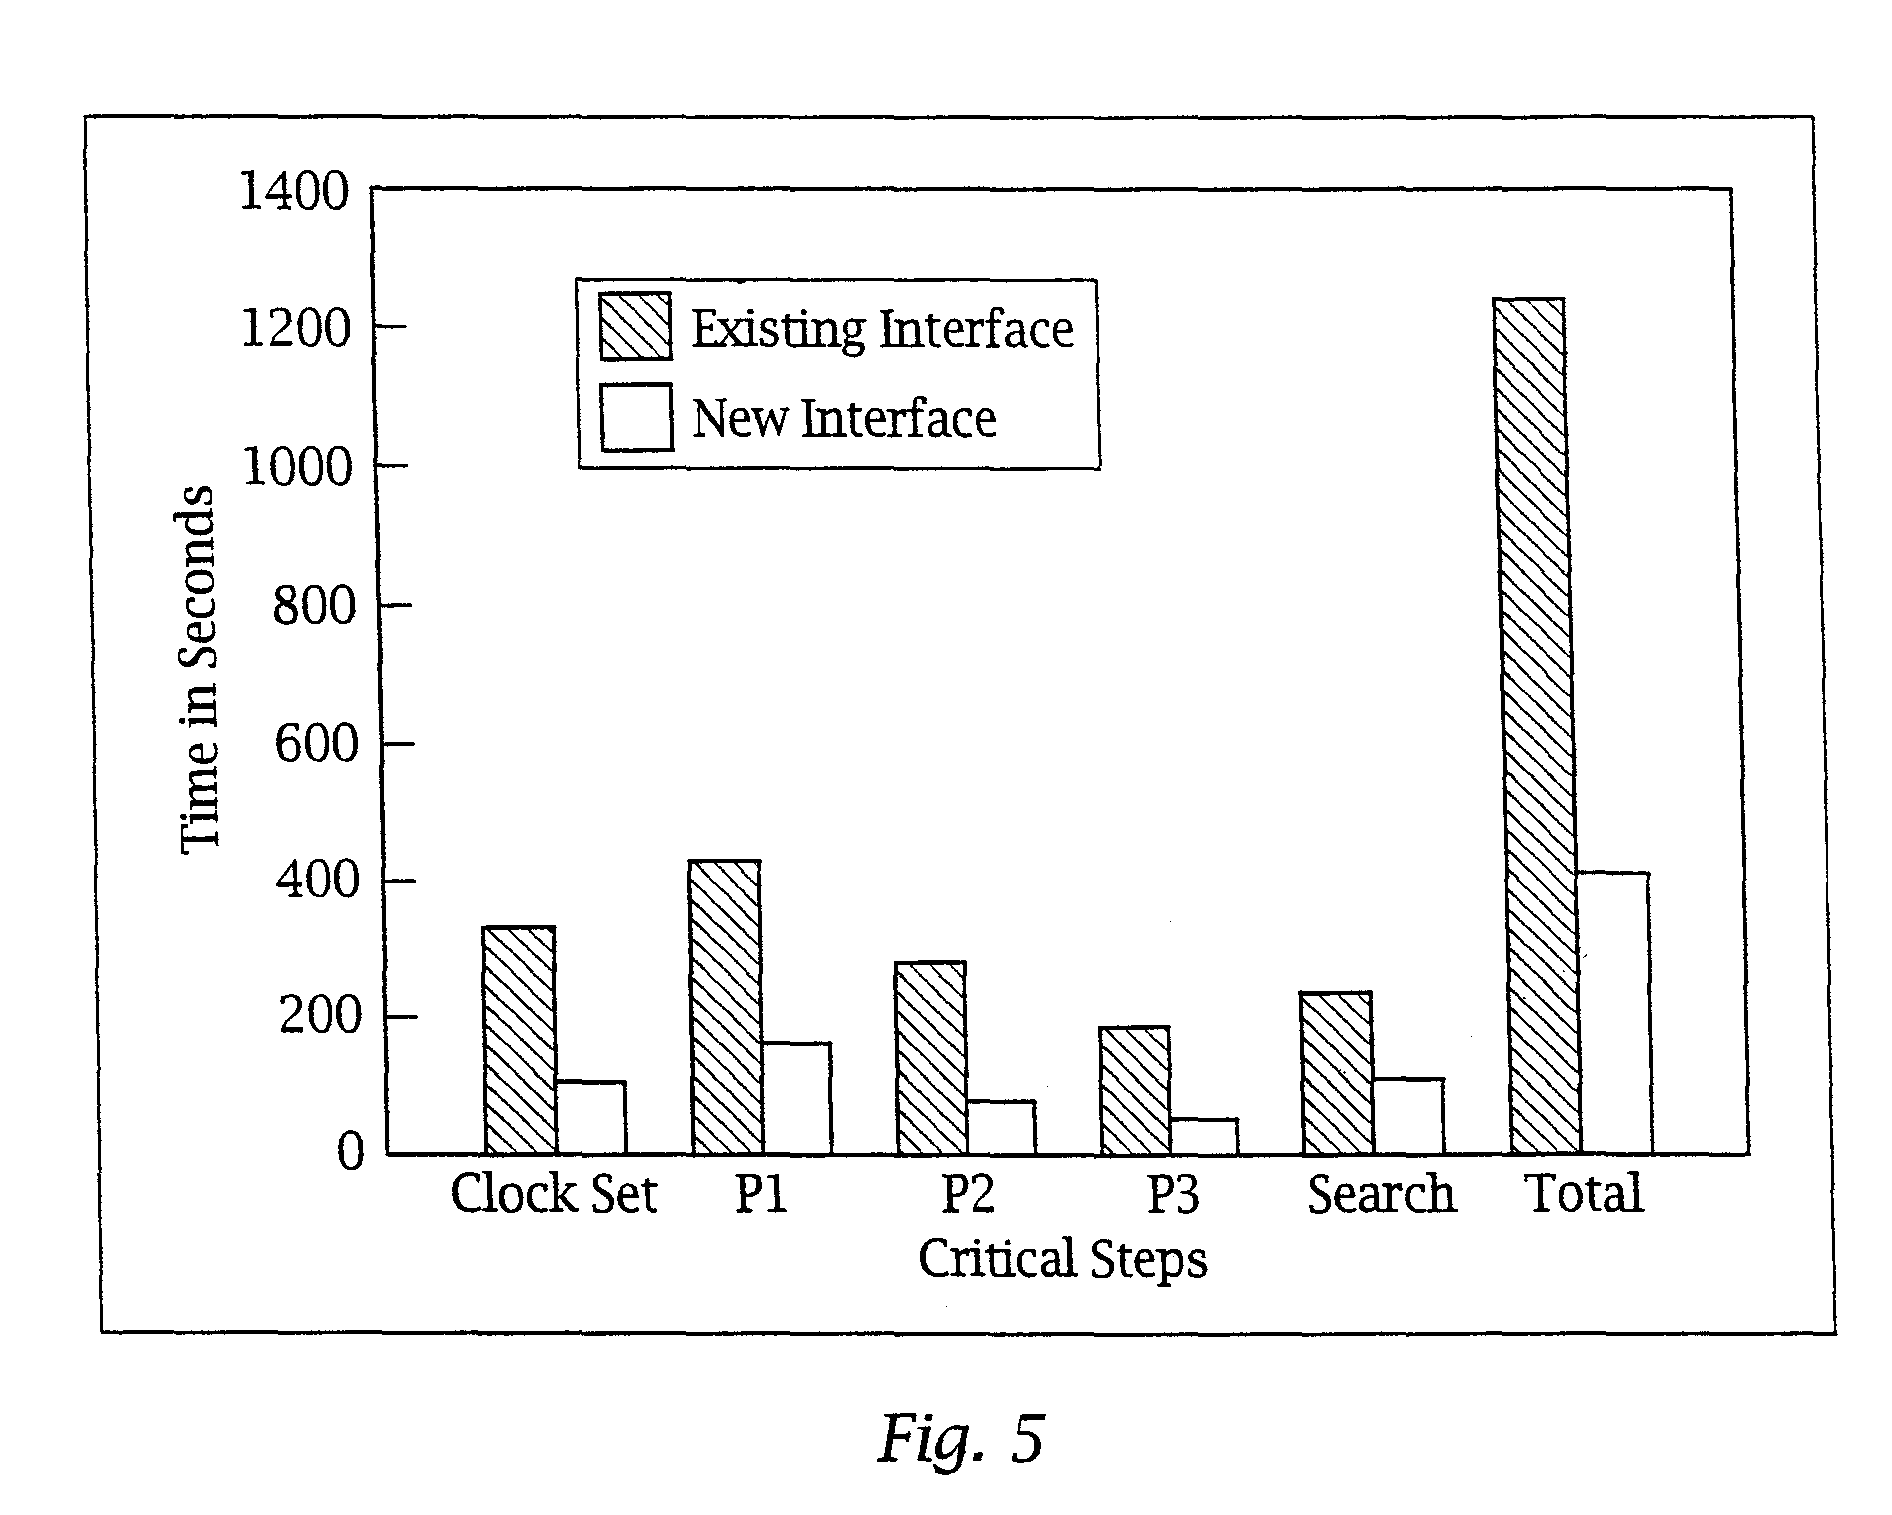 Patent US 7,974,714 B2